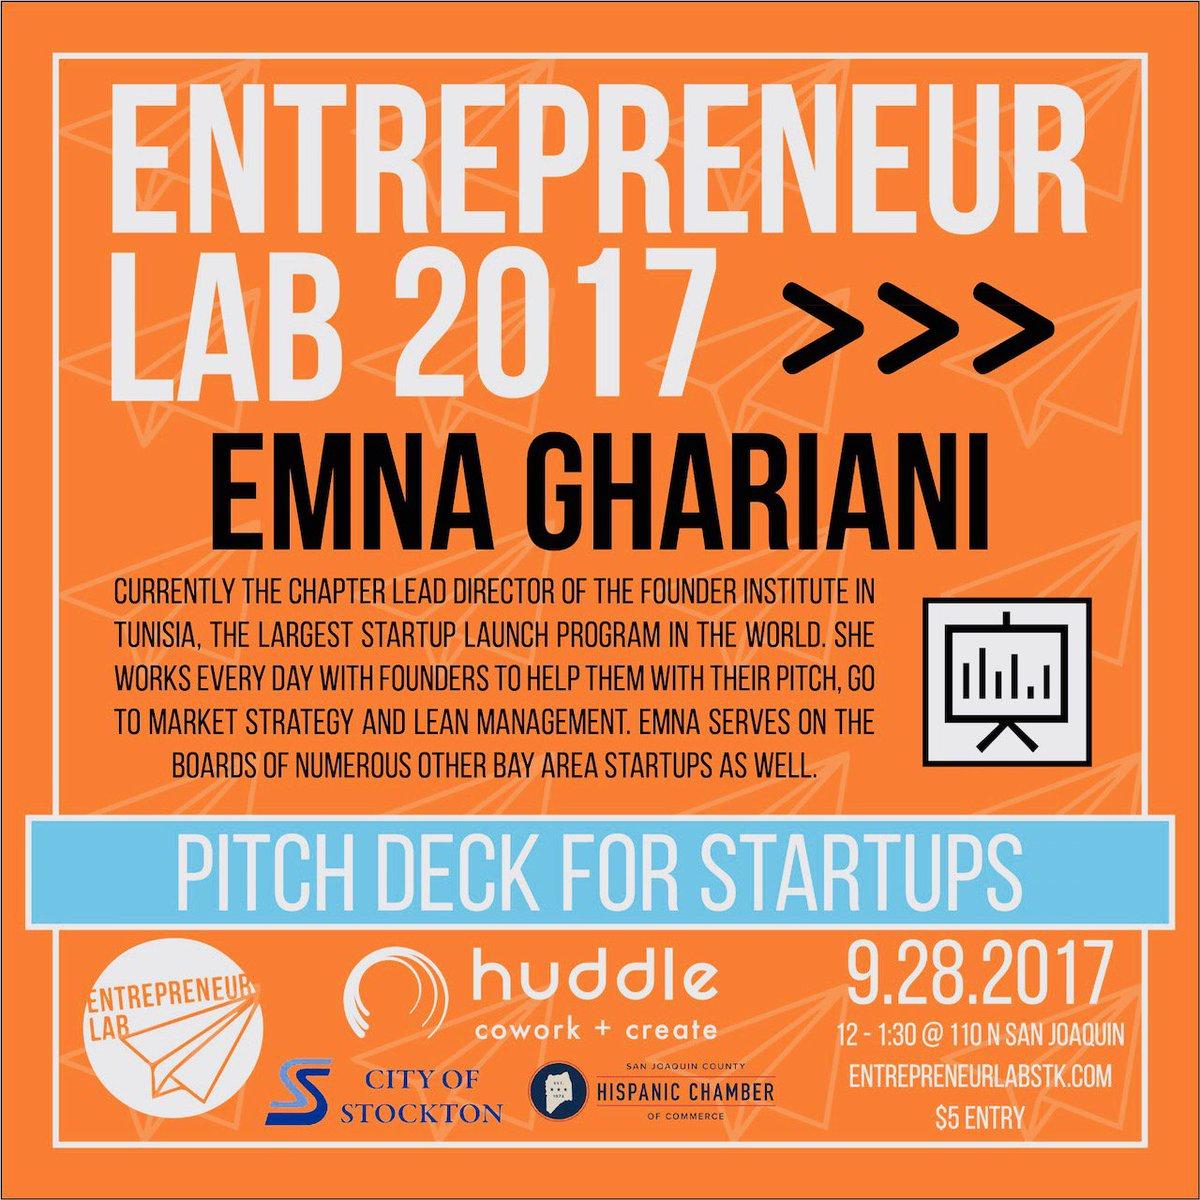 #EmnaGhariani #PitchDecksForStartUps #EntrepreneurLabStk #StocktonCA #HuddleCoWorkingSpace https://t.co/md9FUKsfME…/…/243392669/ https://t.co/MjmfYJv8Y1